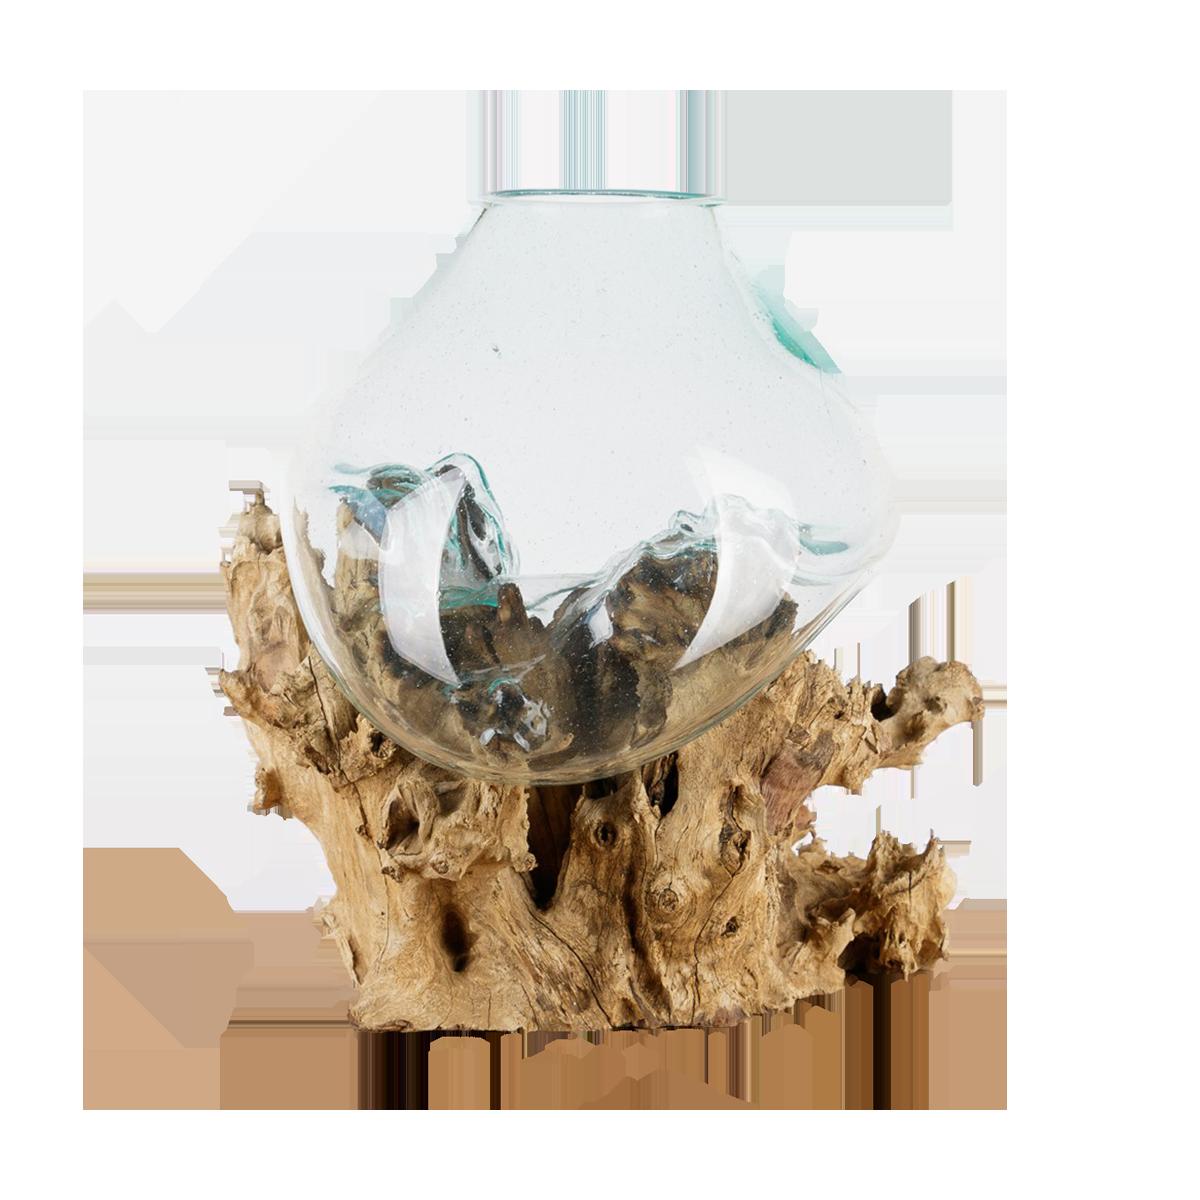 Dekowurzel Drop no.6 Glasgefäß in Tropfenform Wohnraumdekoration